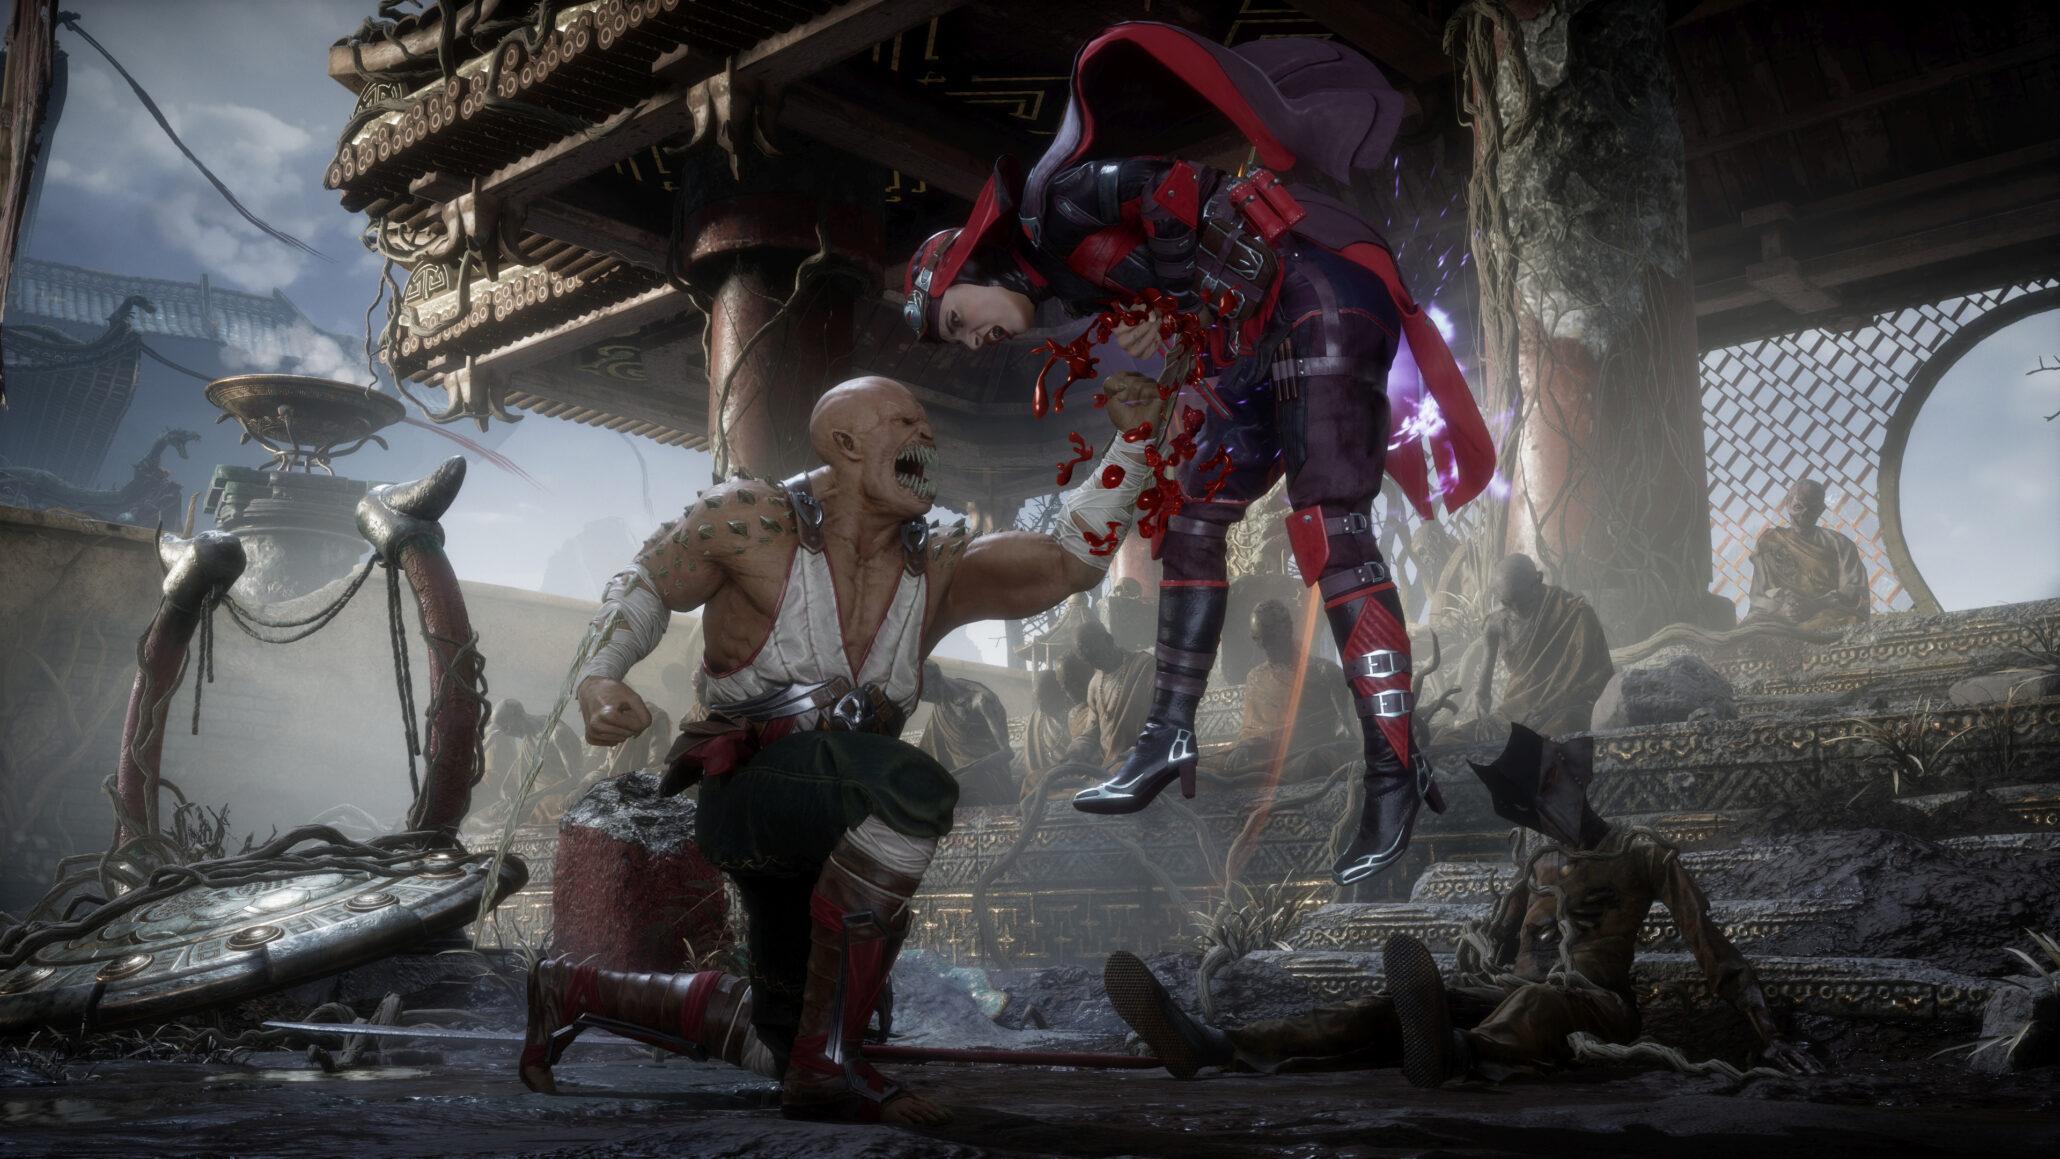 Mortal Kombat 11 Nintendo Switch Digital Version Is Over 20 GB Big